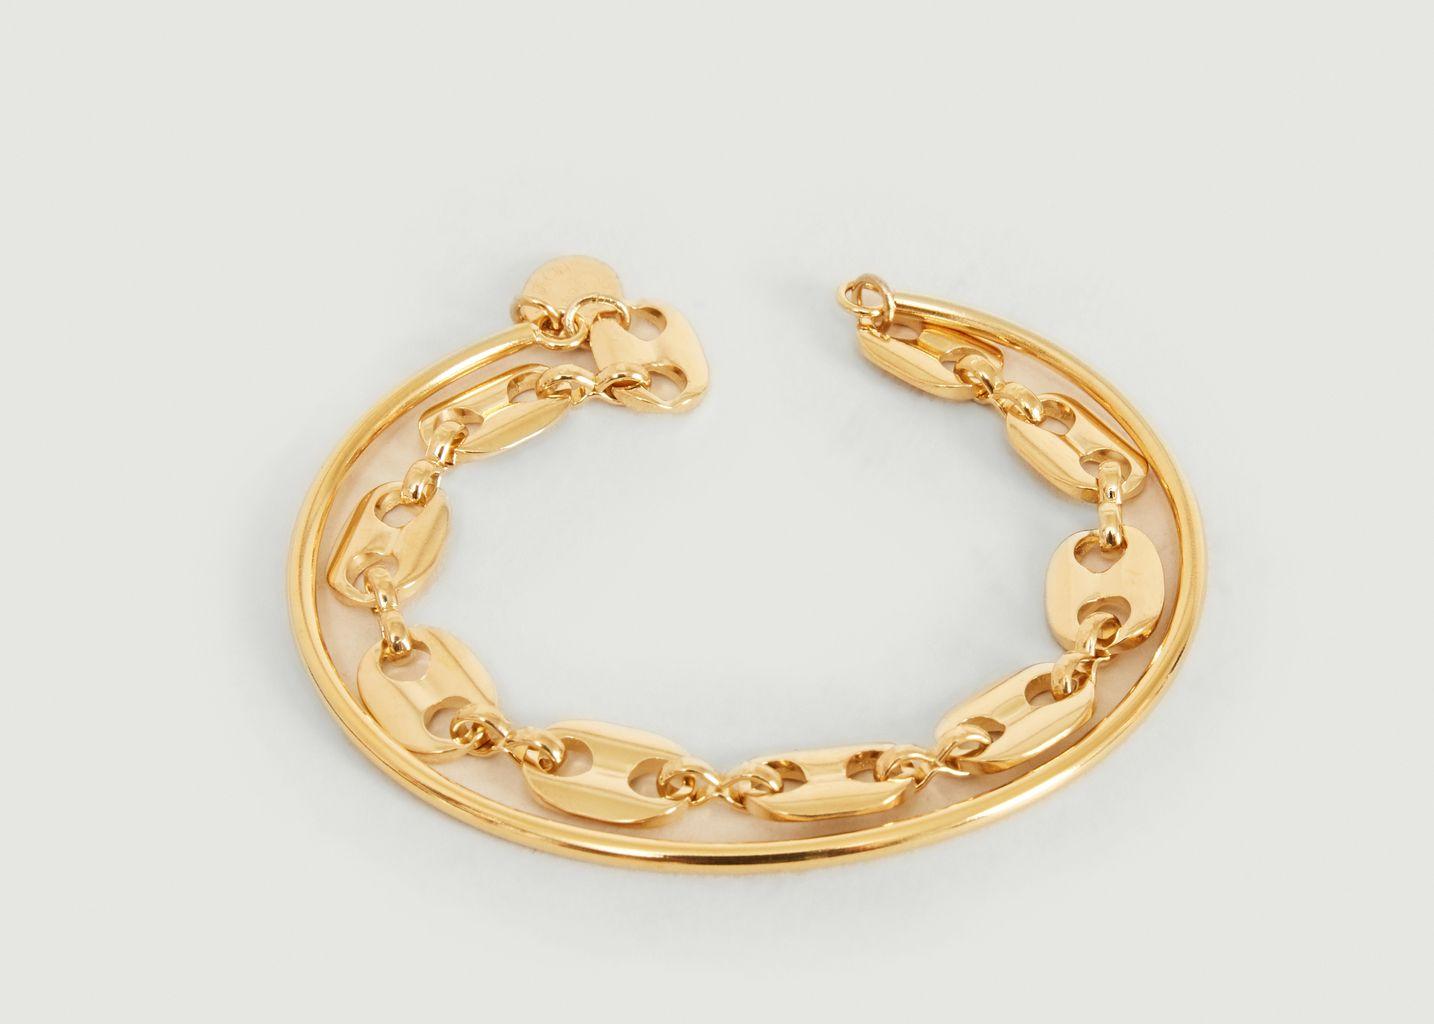 Bracelet jonc double Vaporetto - Medecine Douce